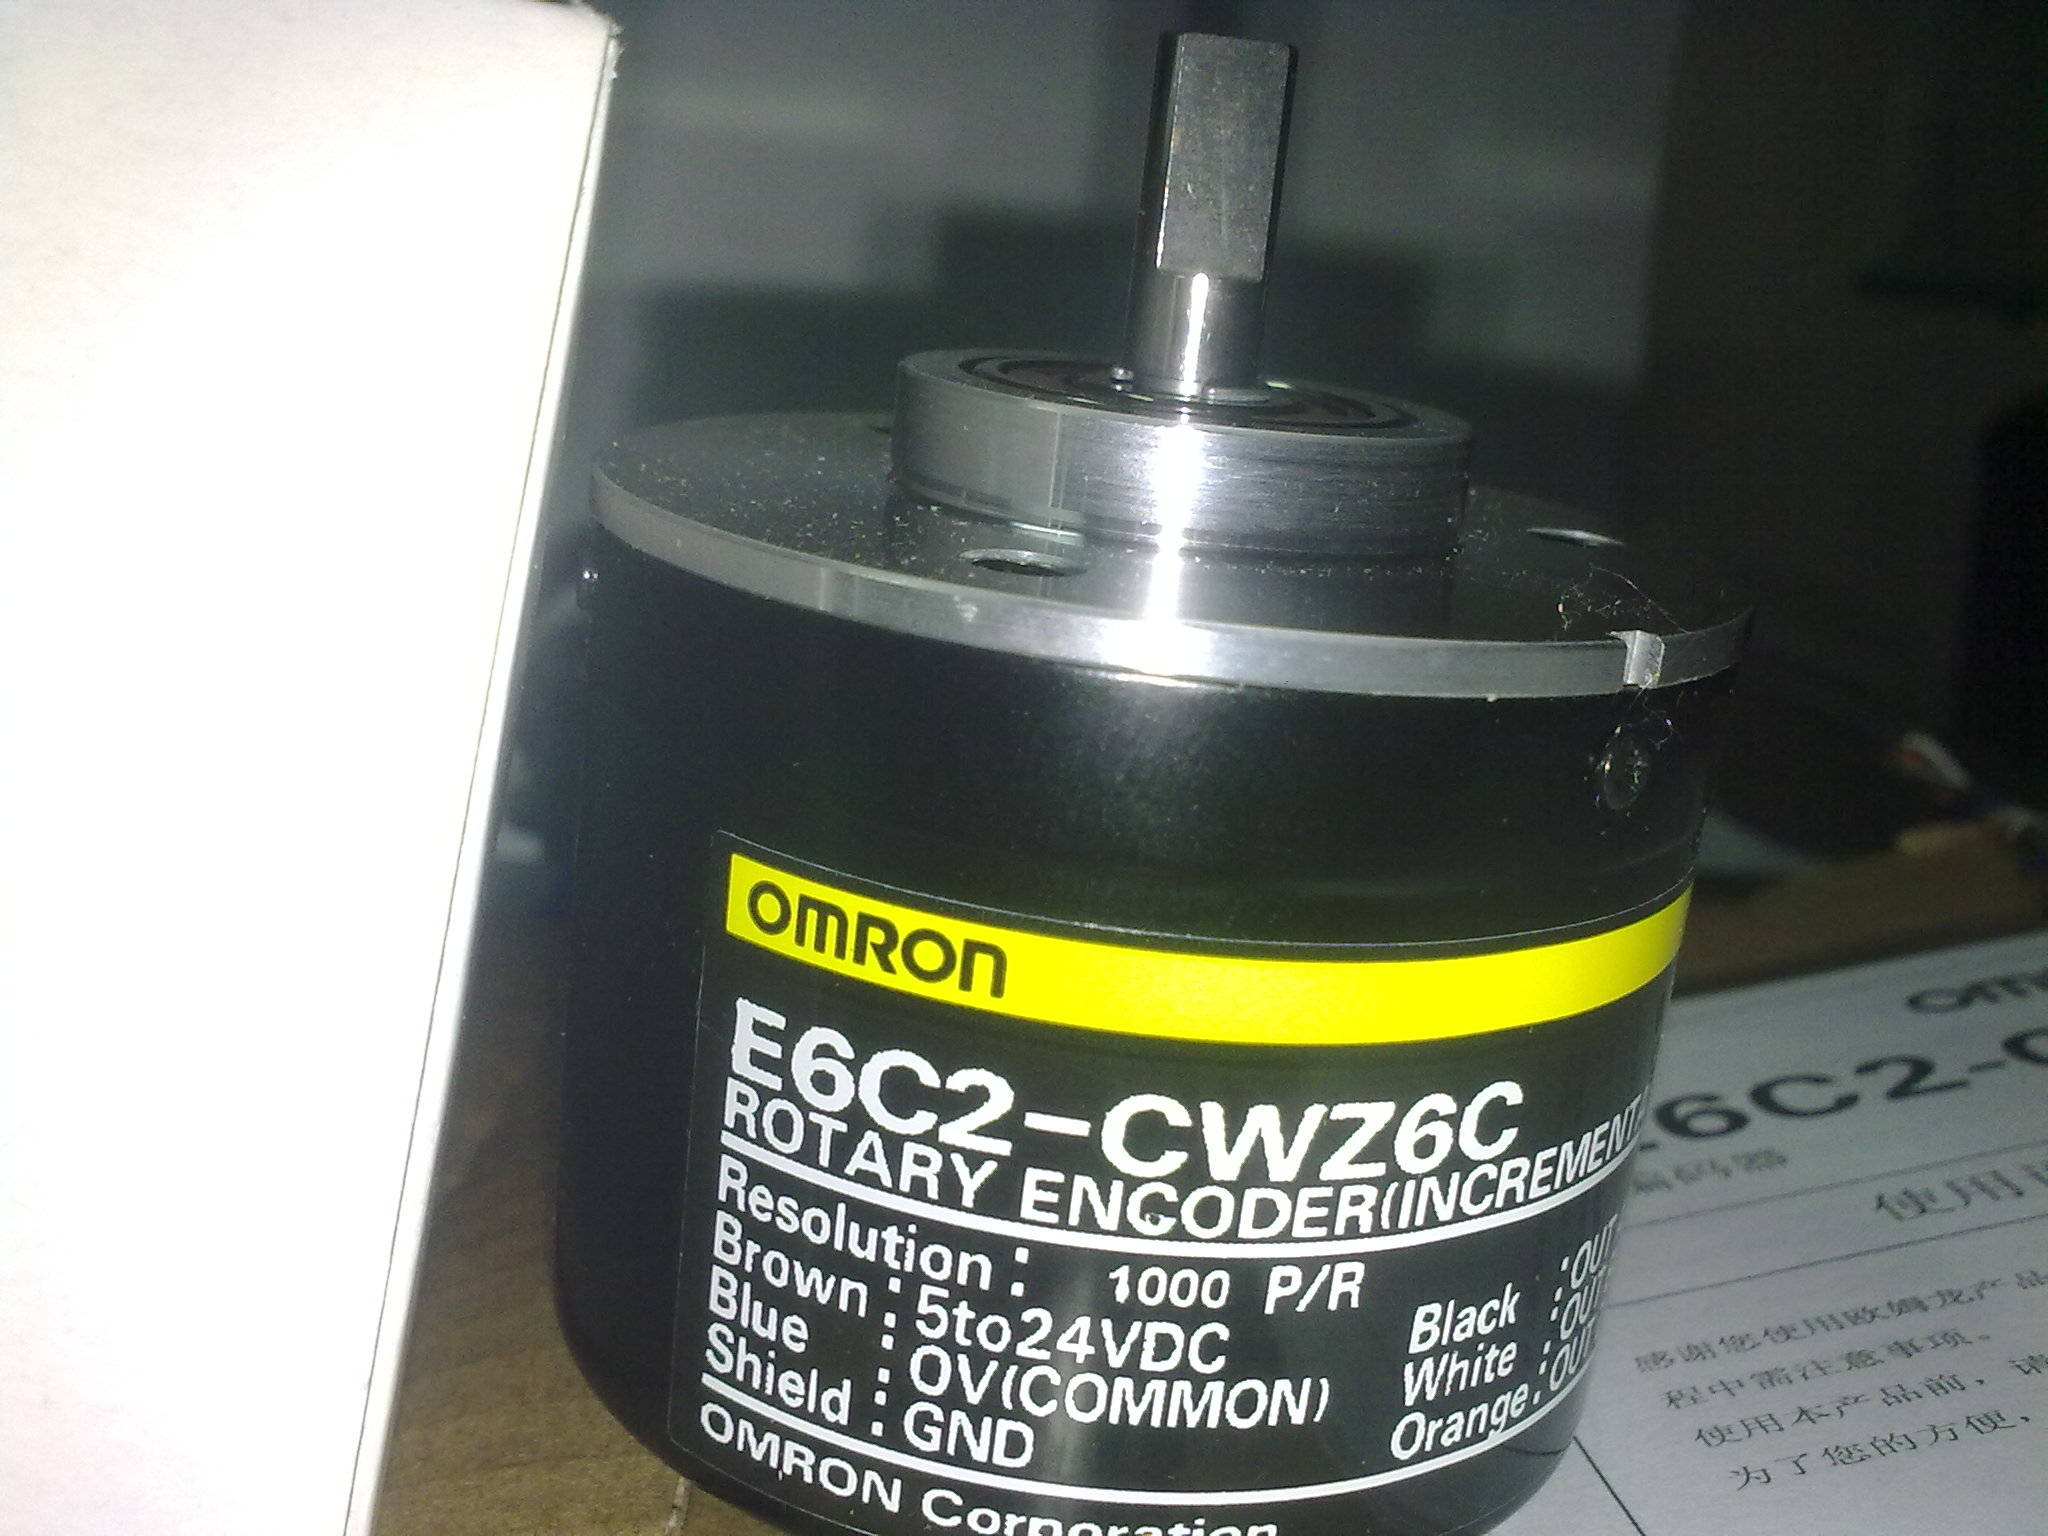 现货欧姆龙omron编码器e6c2-cwz6c